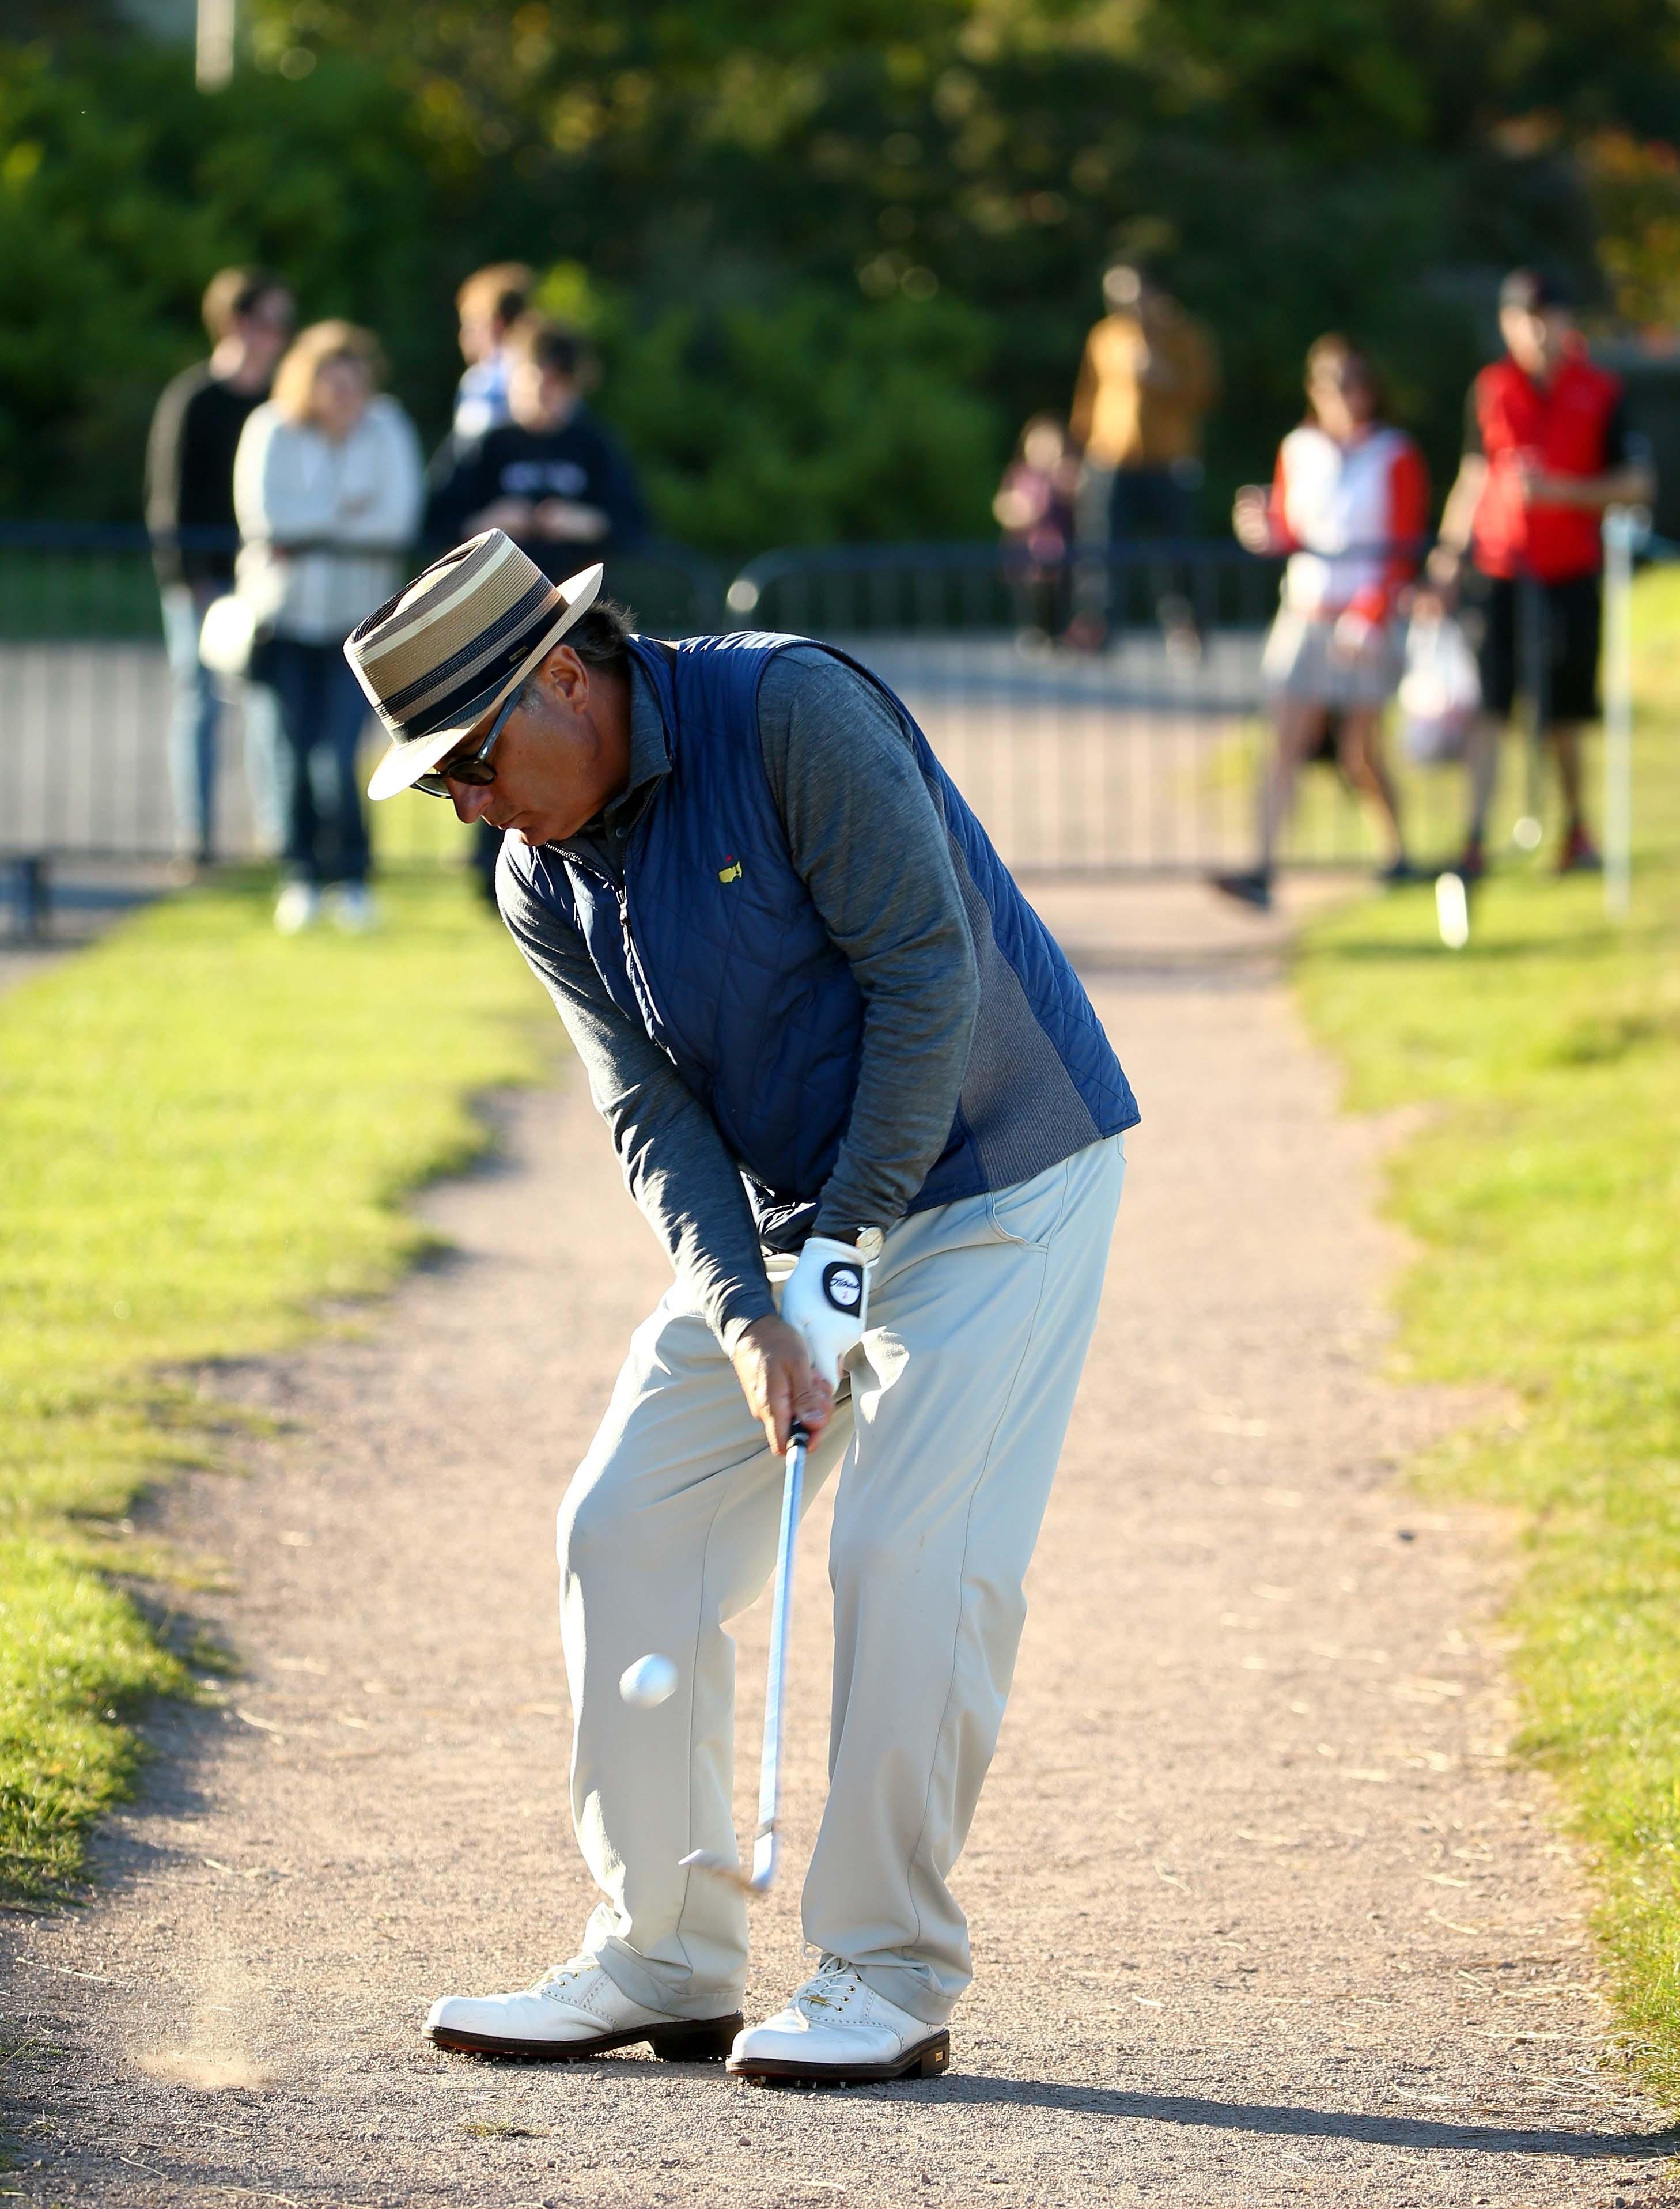 Golfing by land ...